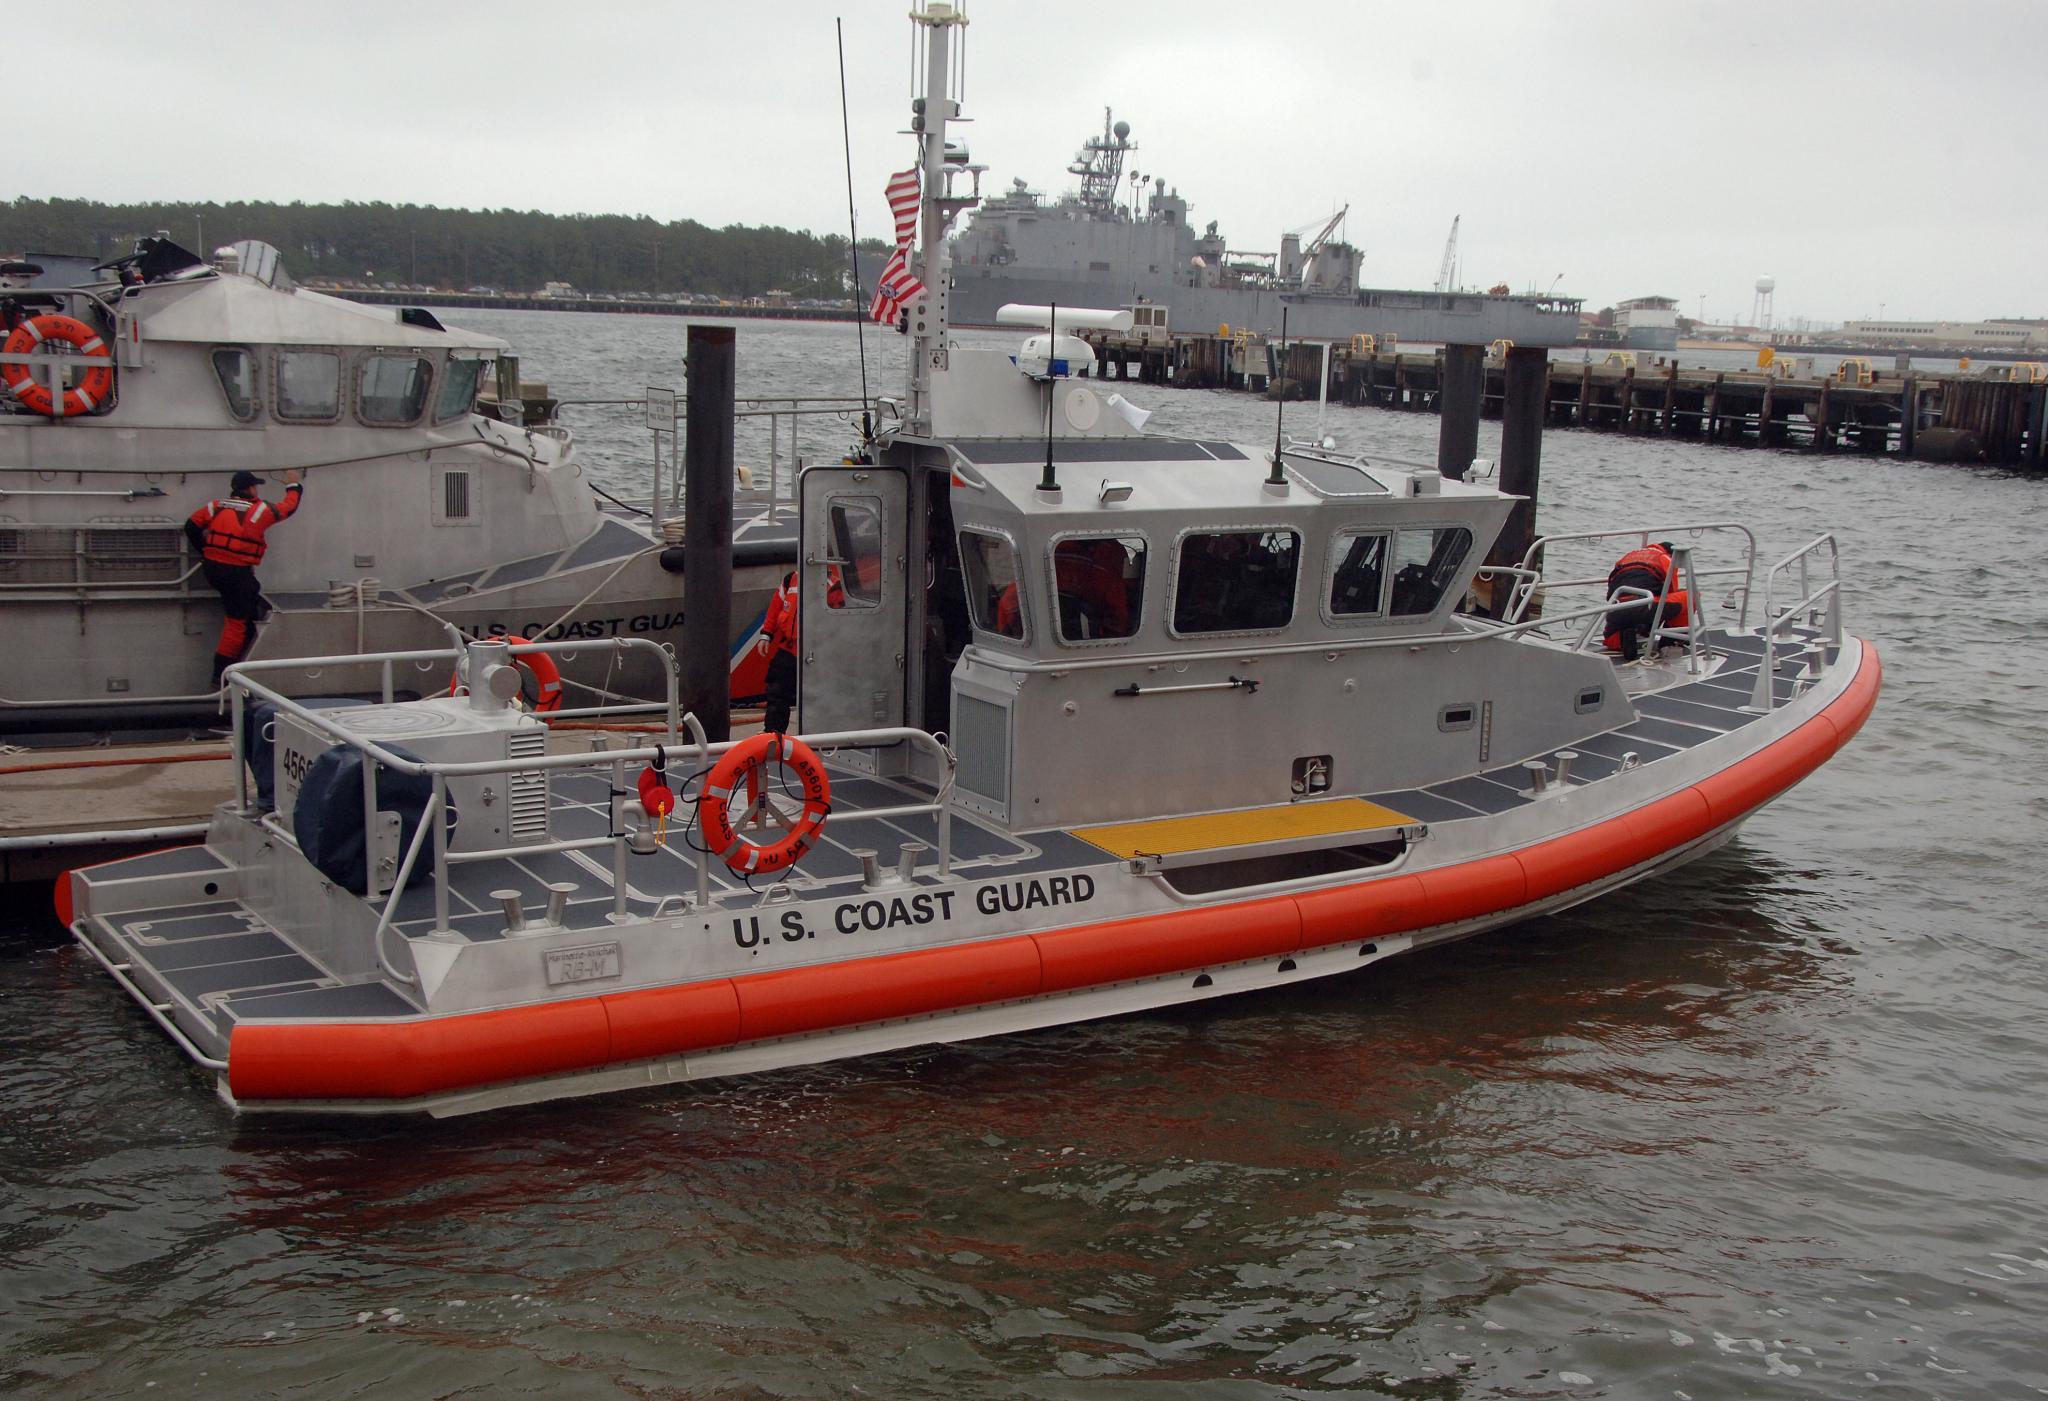 Response boat photo